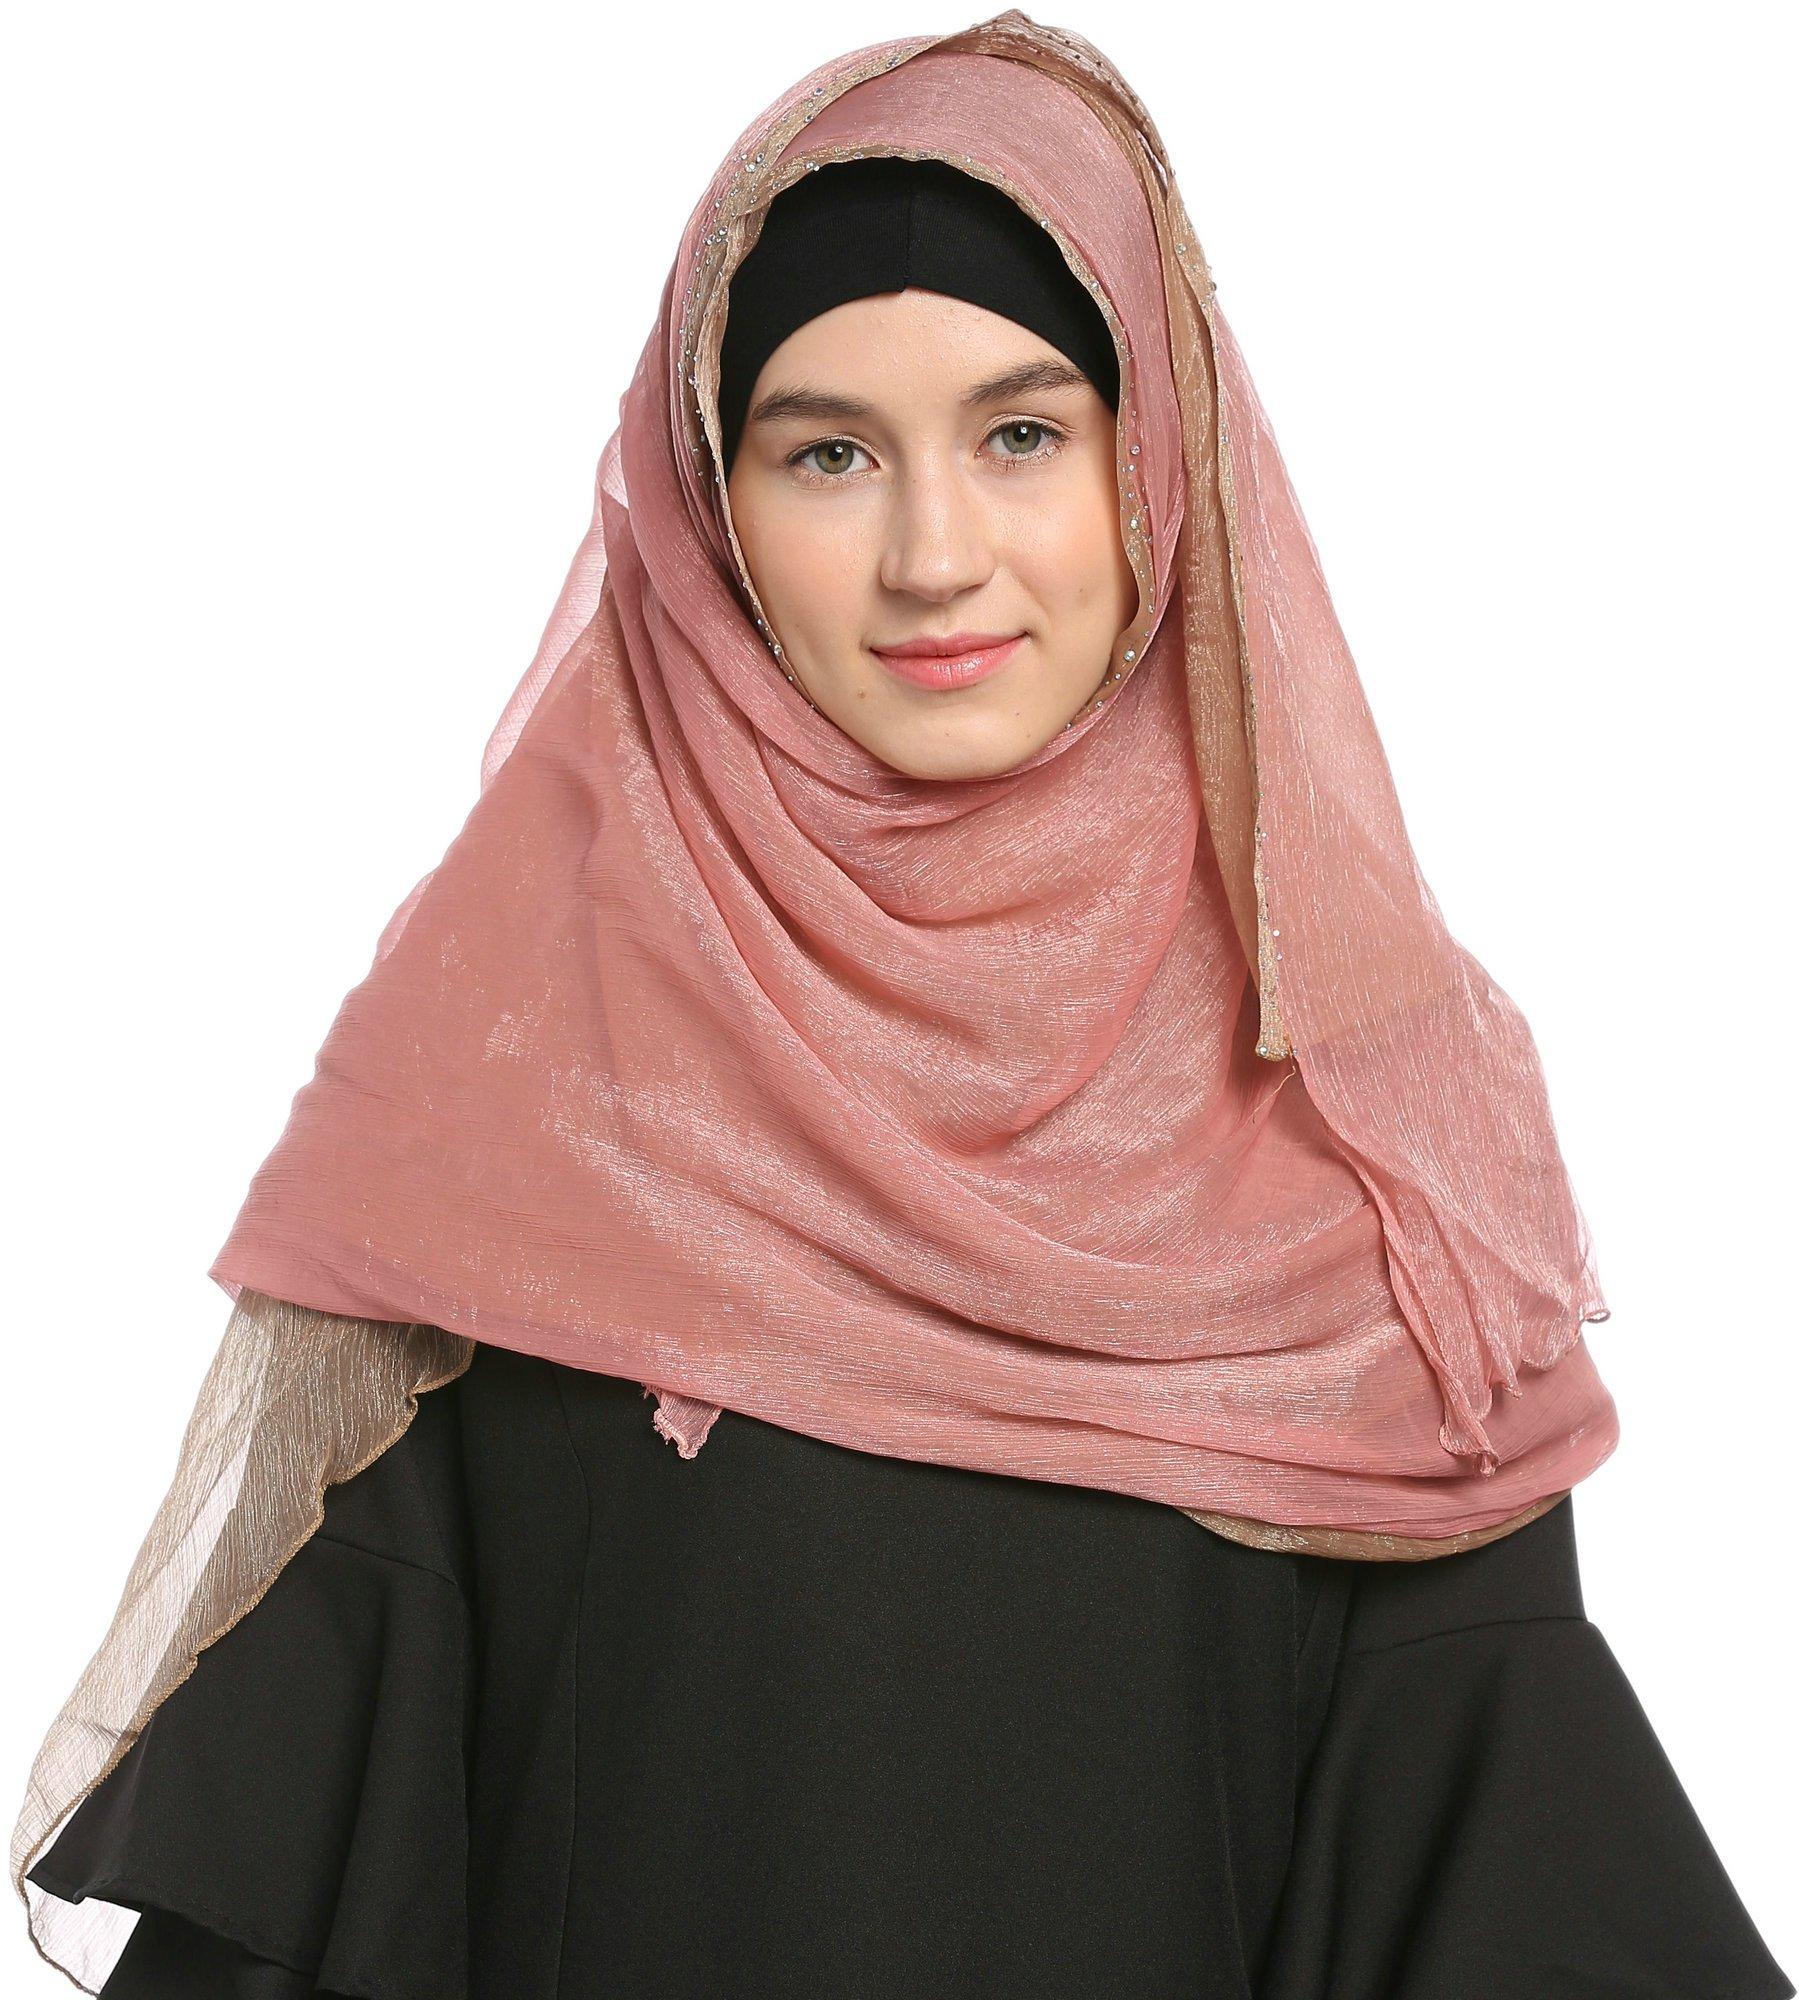 Ababalaya Lace Decorated Wedding Hijab Islamic Hijab,Color3 by Ababalaya (Image #1)